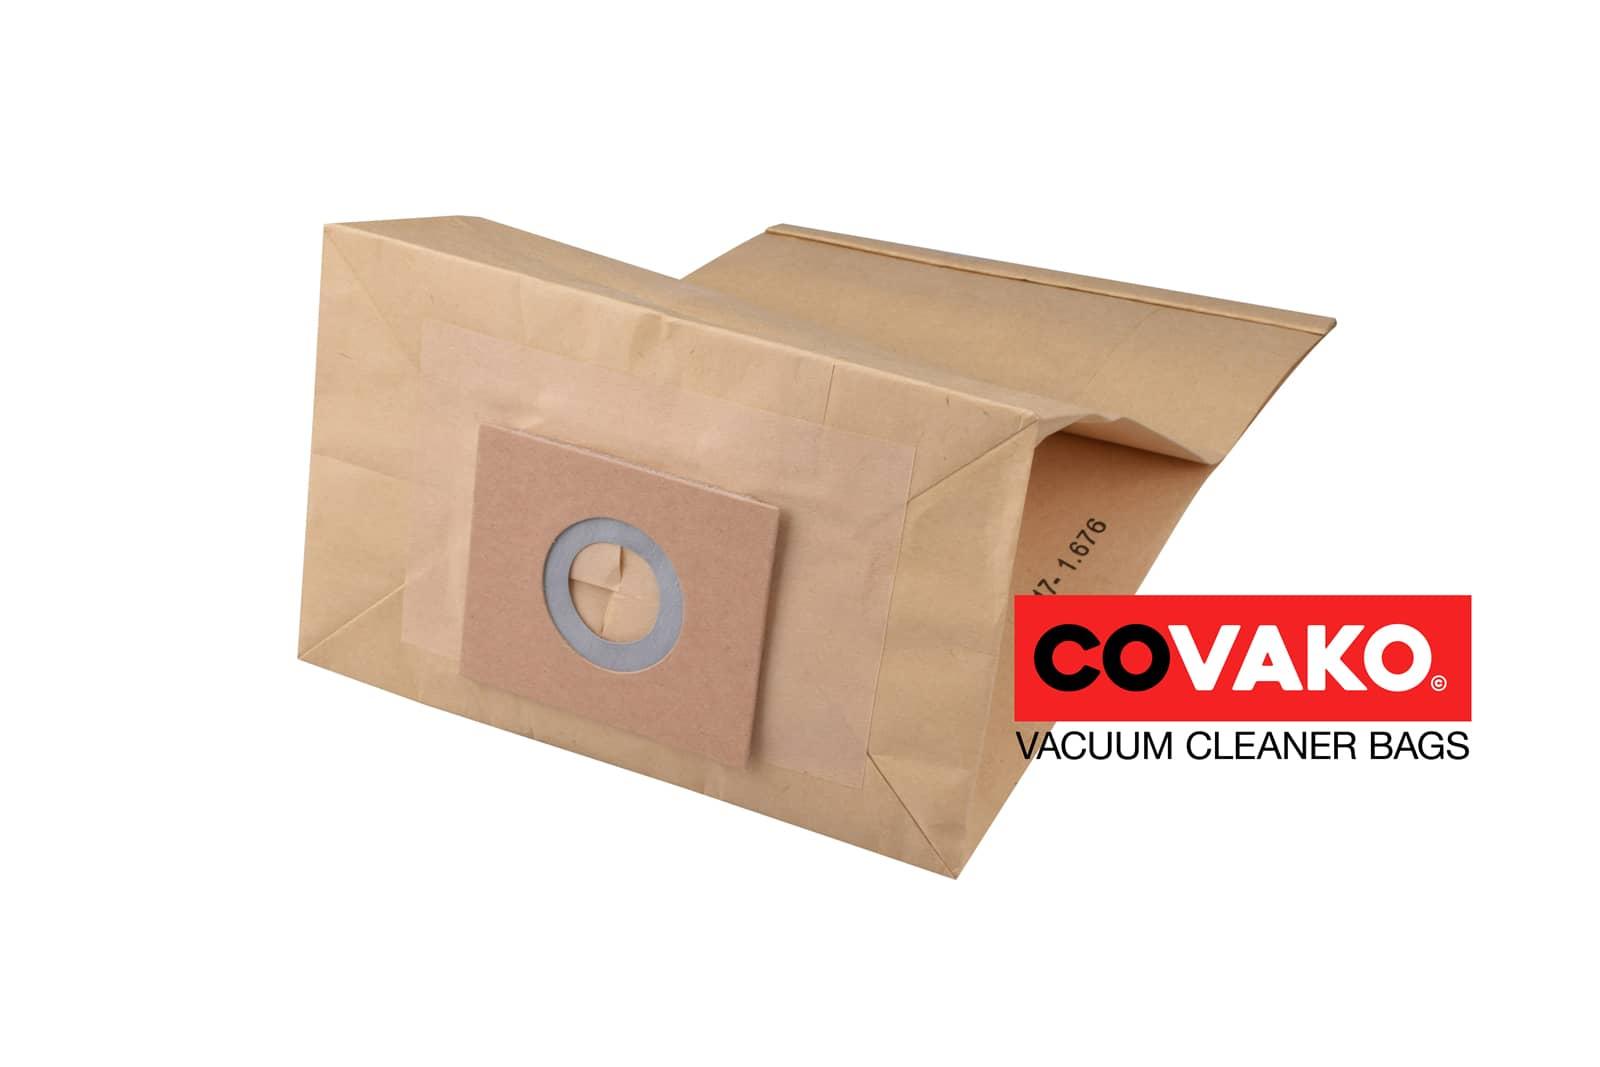 I-vac Dryver 15R / Papier - I-vac stofzuigerzakken